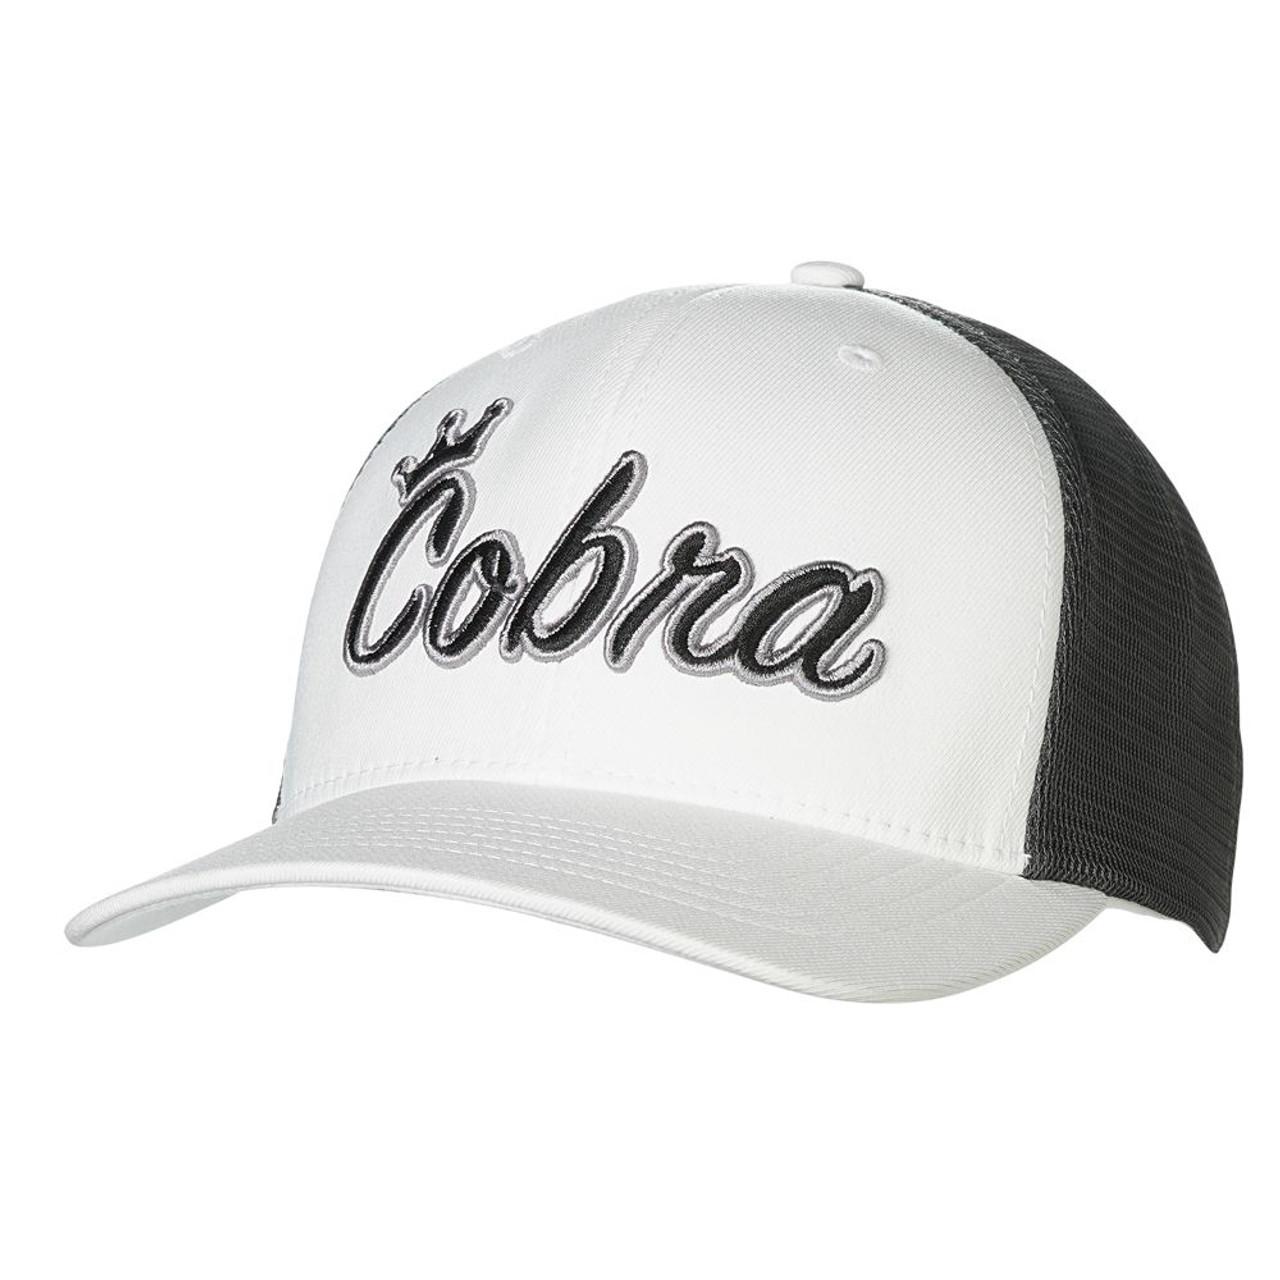 Cobra Crown C Trucker Snapback Cap - White